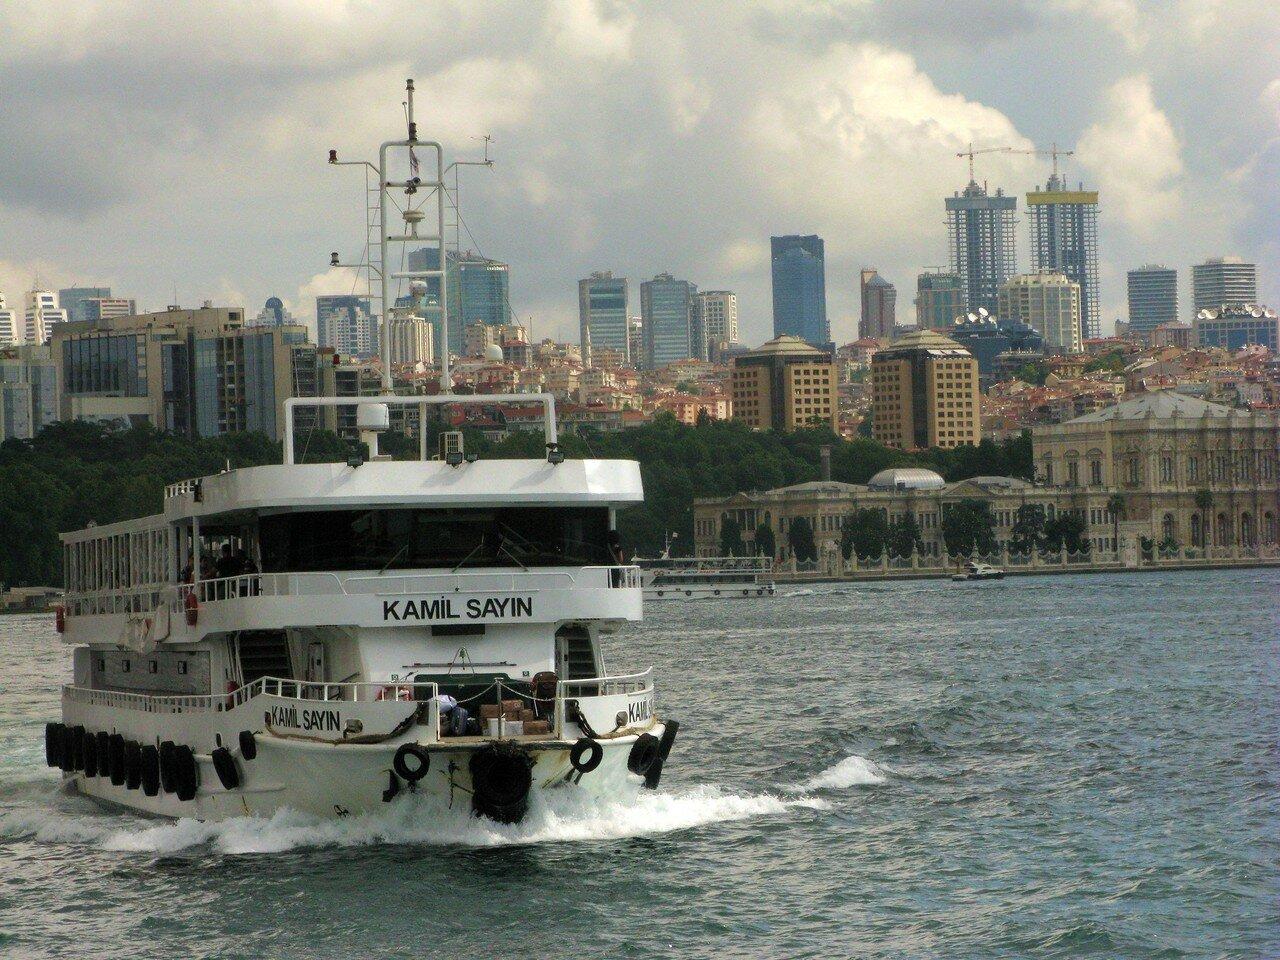 Стамбул -город контрастов. Автор фото: Станислав Кривошеев